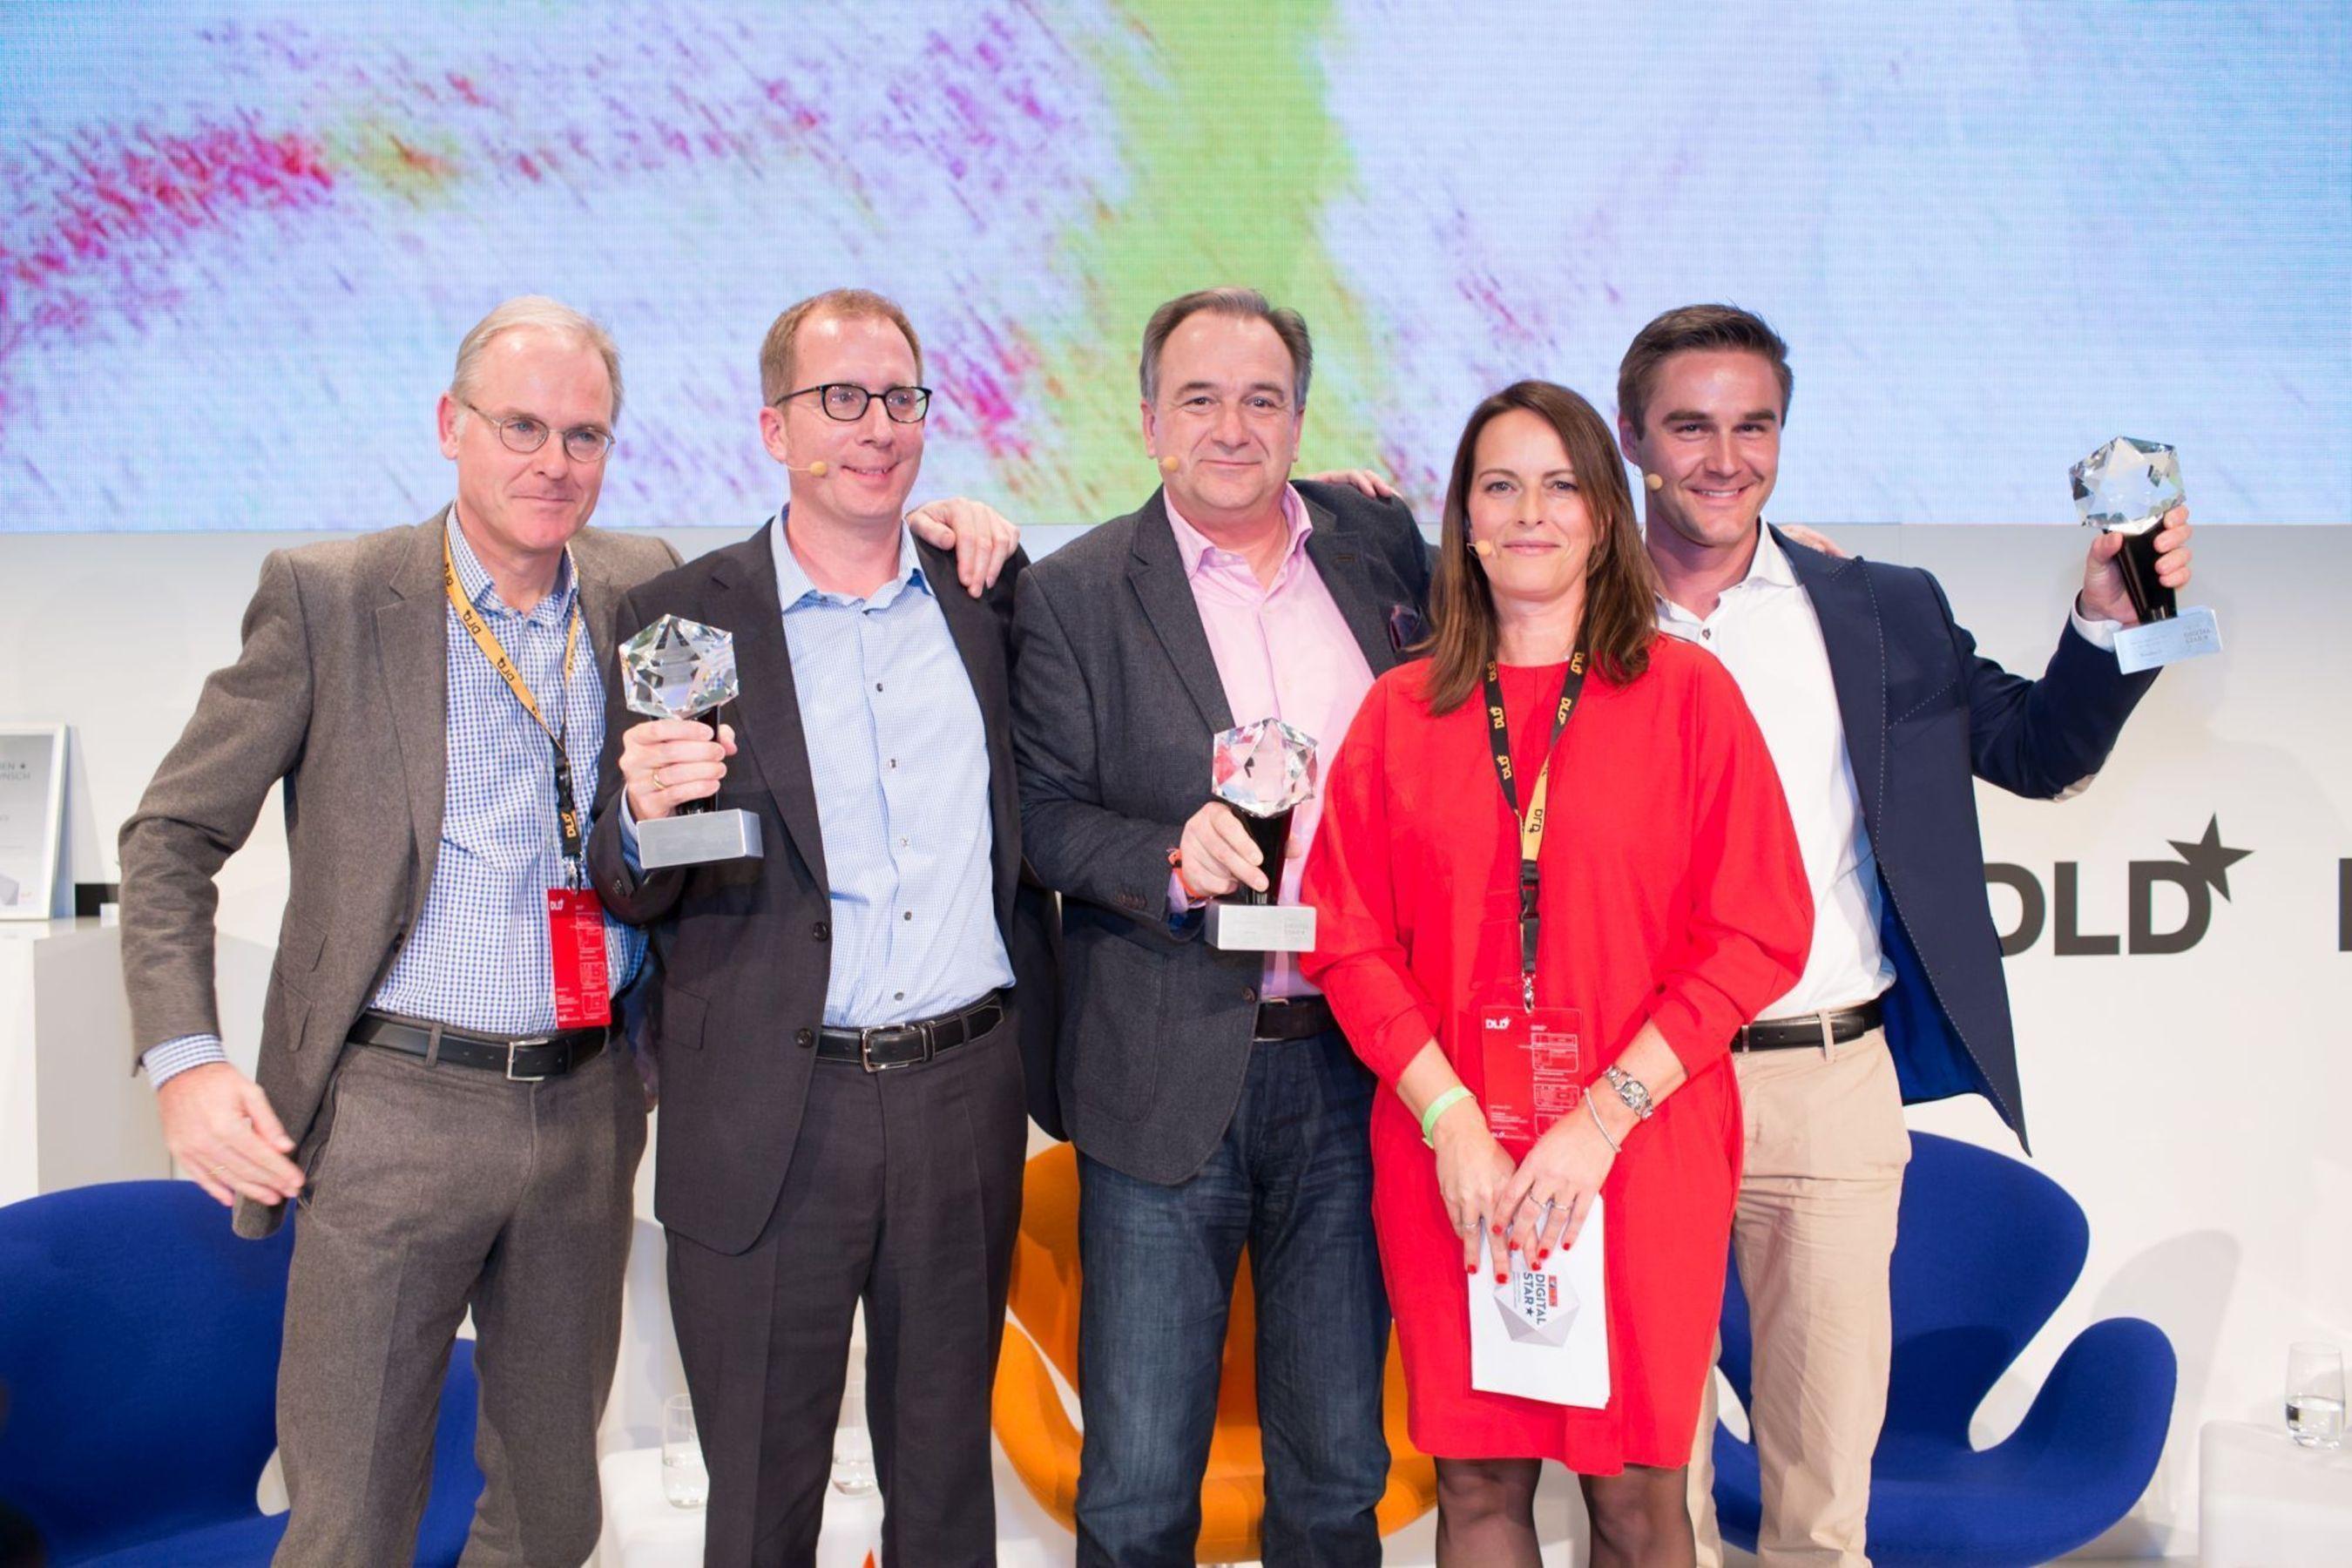 The Focus Digital Stars with editor in chief Ulrich Reitz and Susann Remke (PRNewsFoto/Hubert Burda Media)